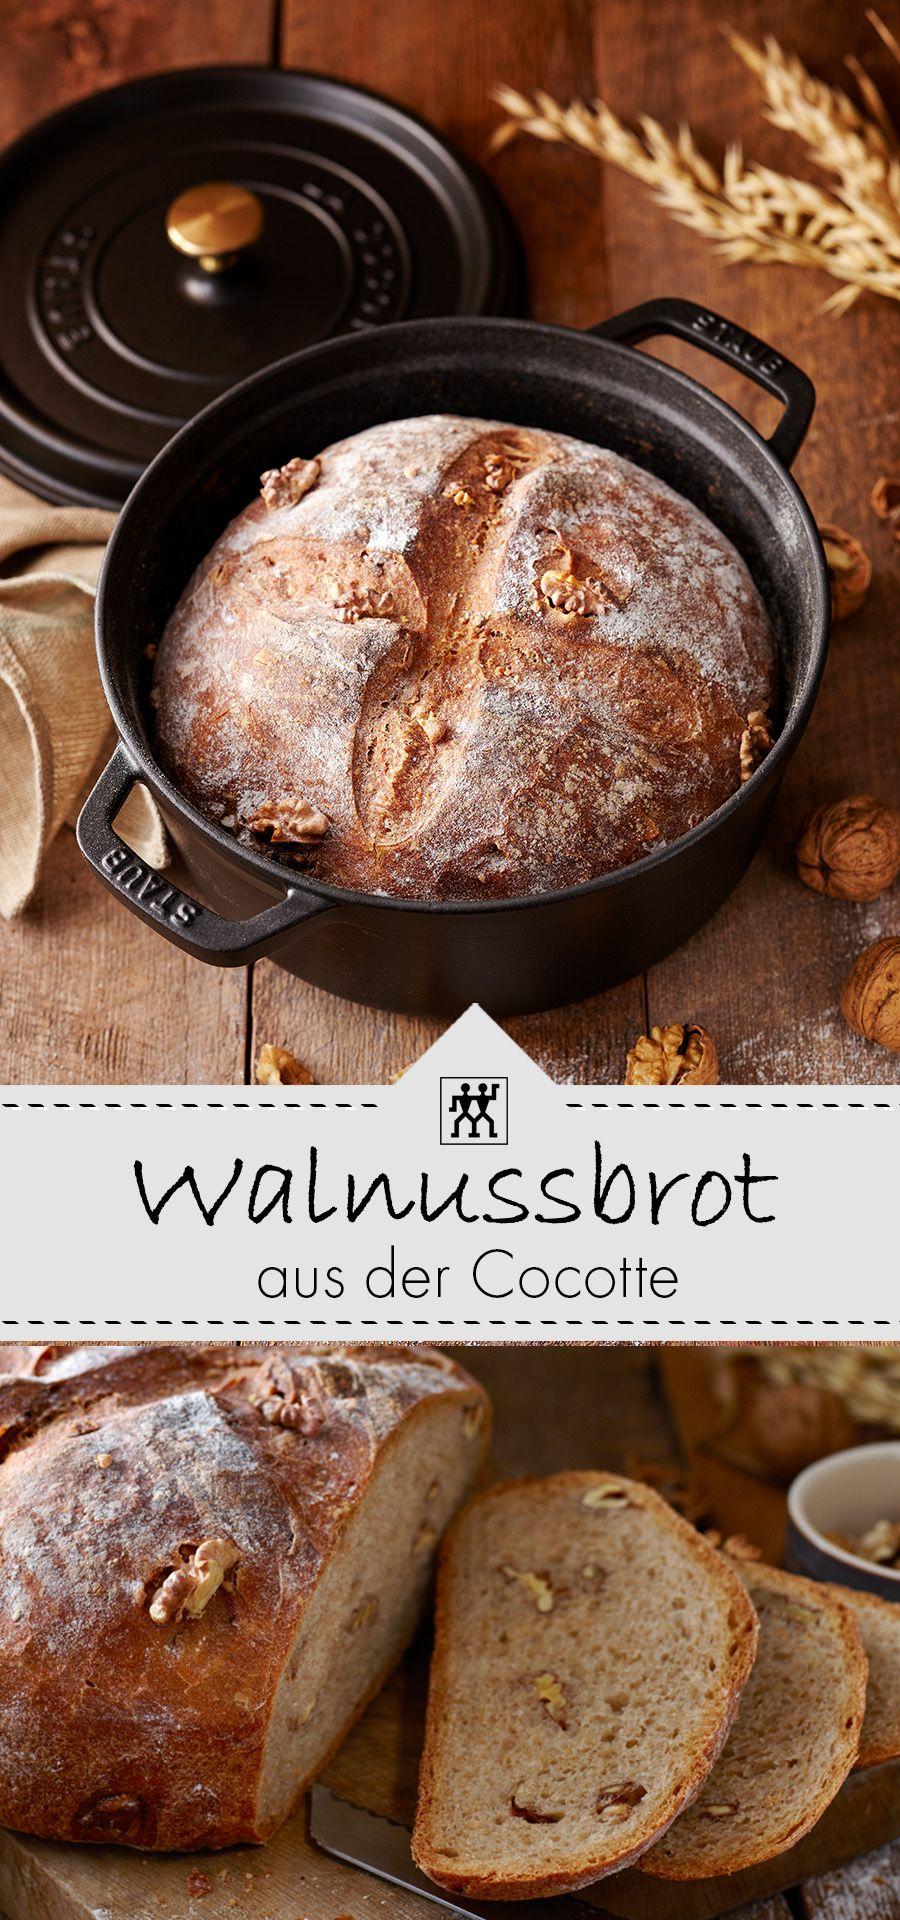 67689c78b7f9f443cf0770efd2faaef7 - Walnuss Brot Rezepte